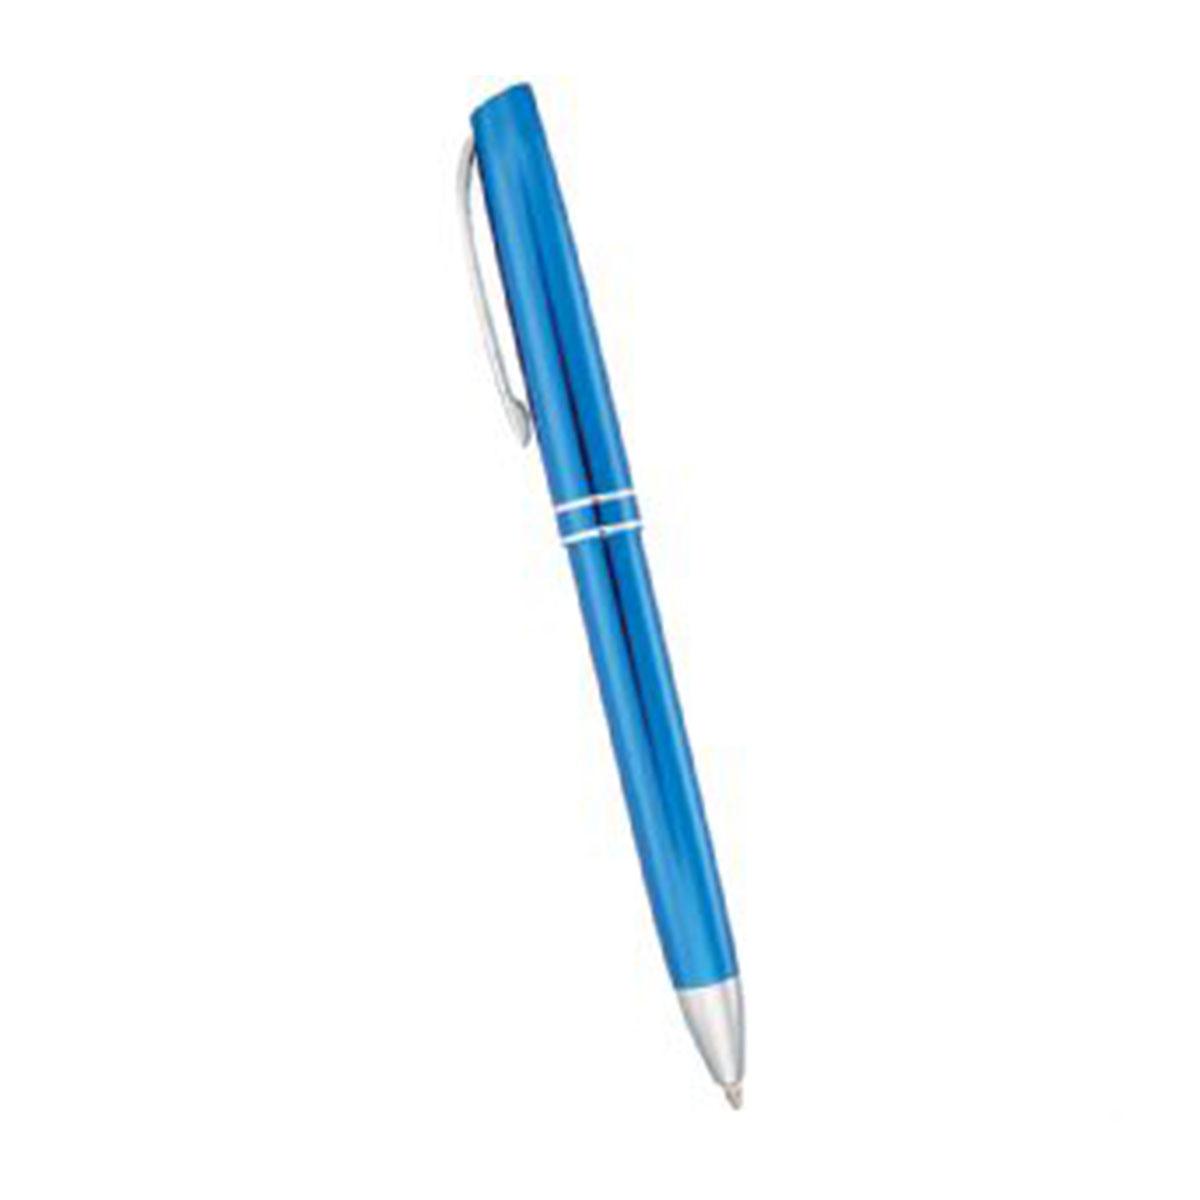 Hemingway Click Ballpoint Pen-Blue with silver trim.